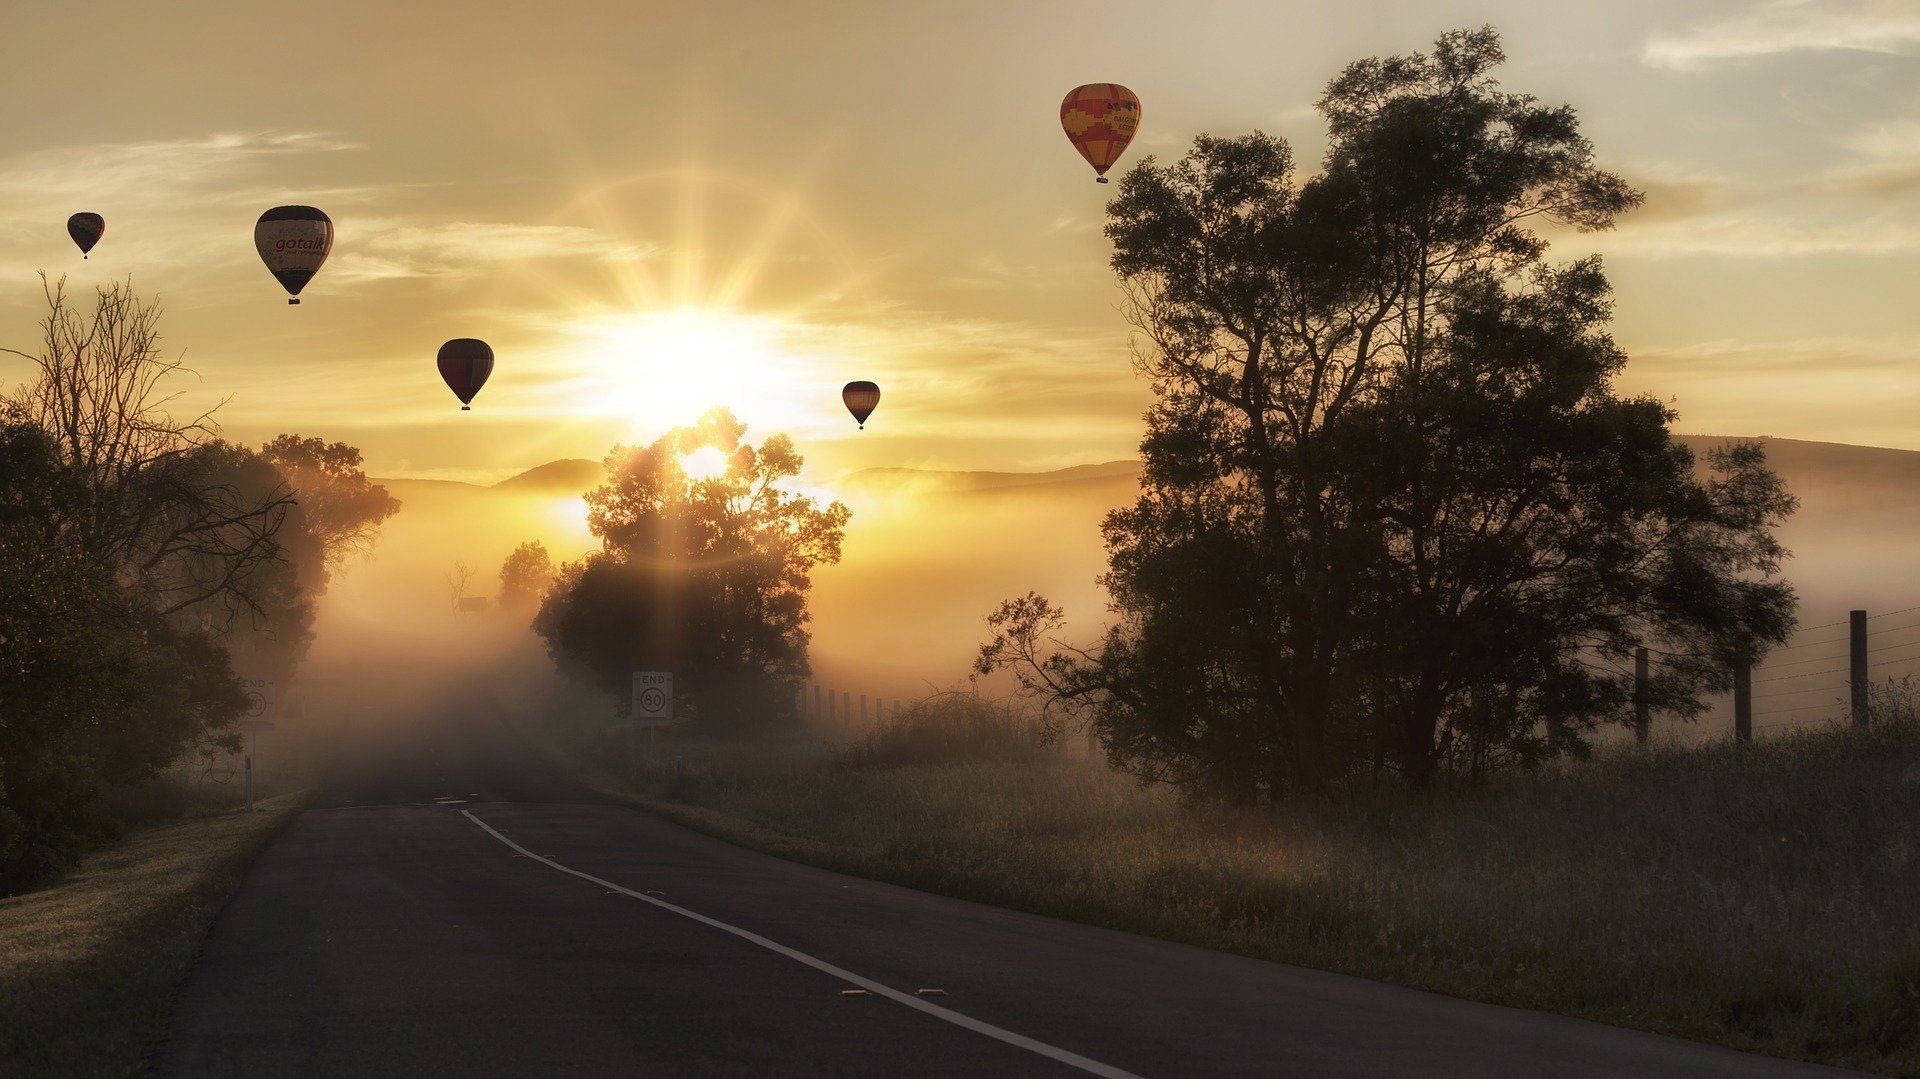 alle ballen in de lucht - luchtballon / loslaten